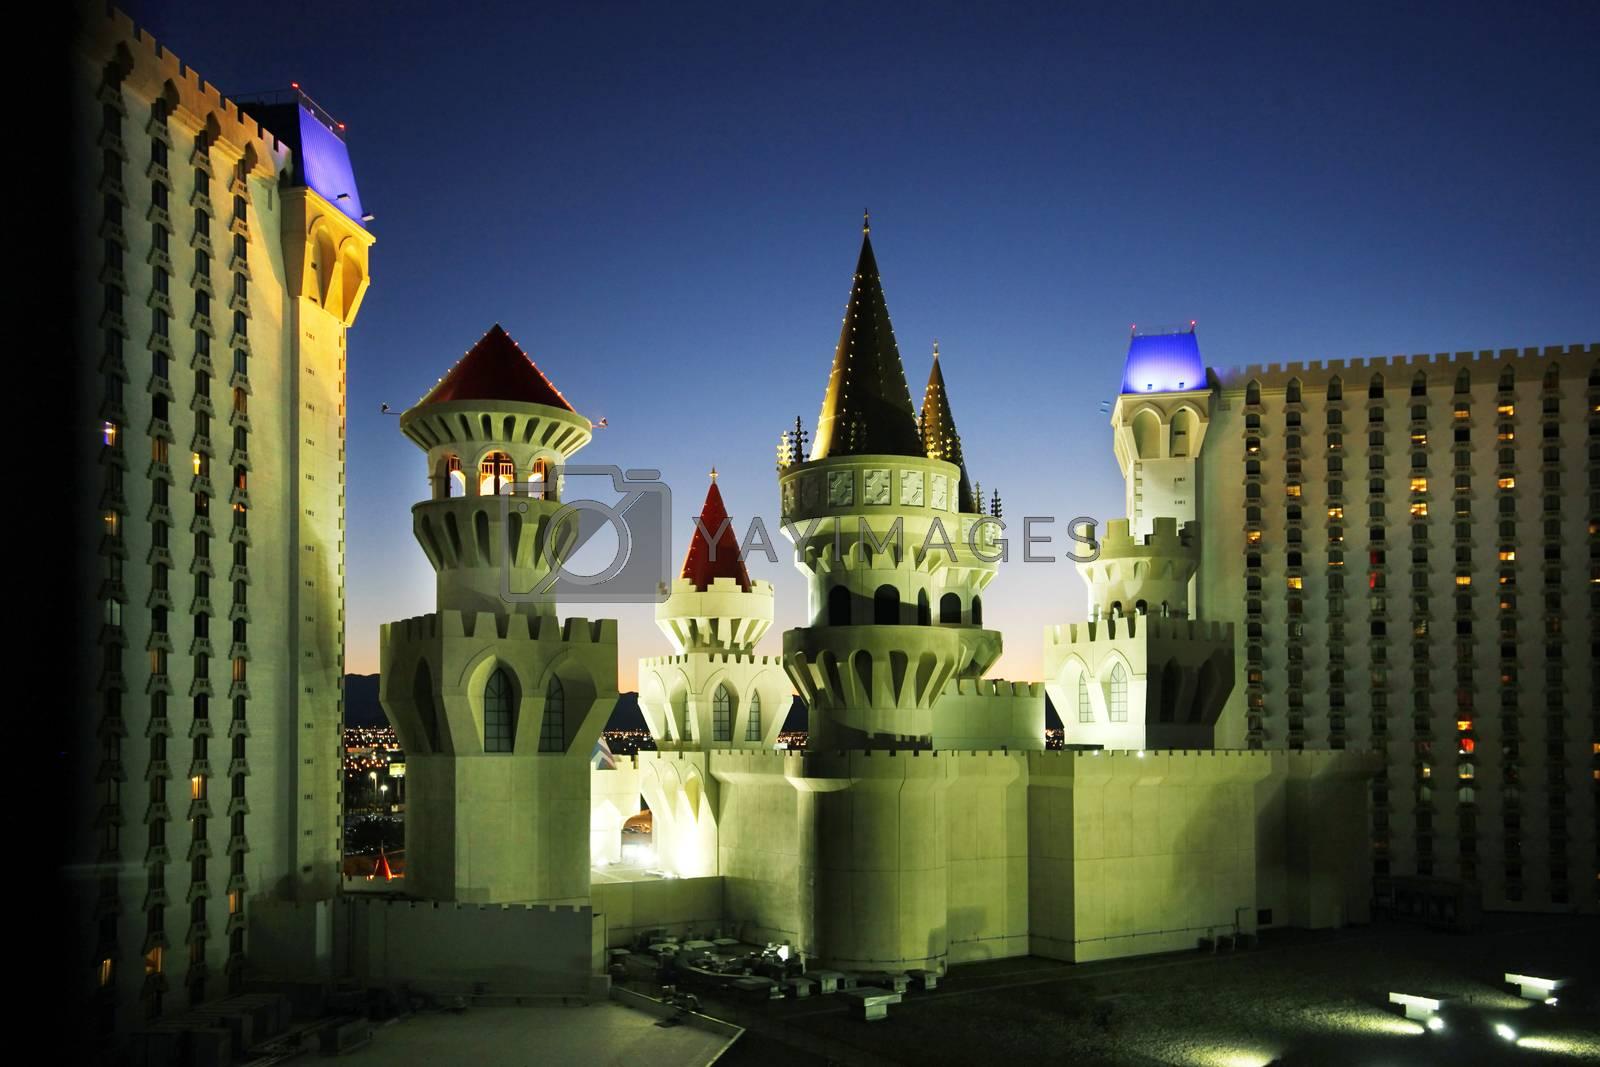 Las Vegas, Nevada, USA - September 19, 2011: The Excalibur Hotel & Casino is shown in this image taken at night in Las Vegas, Nevada.